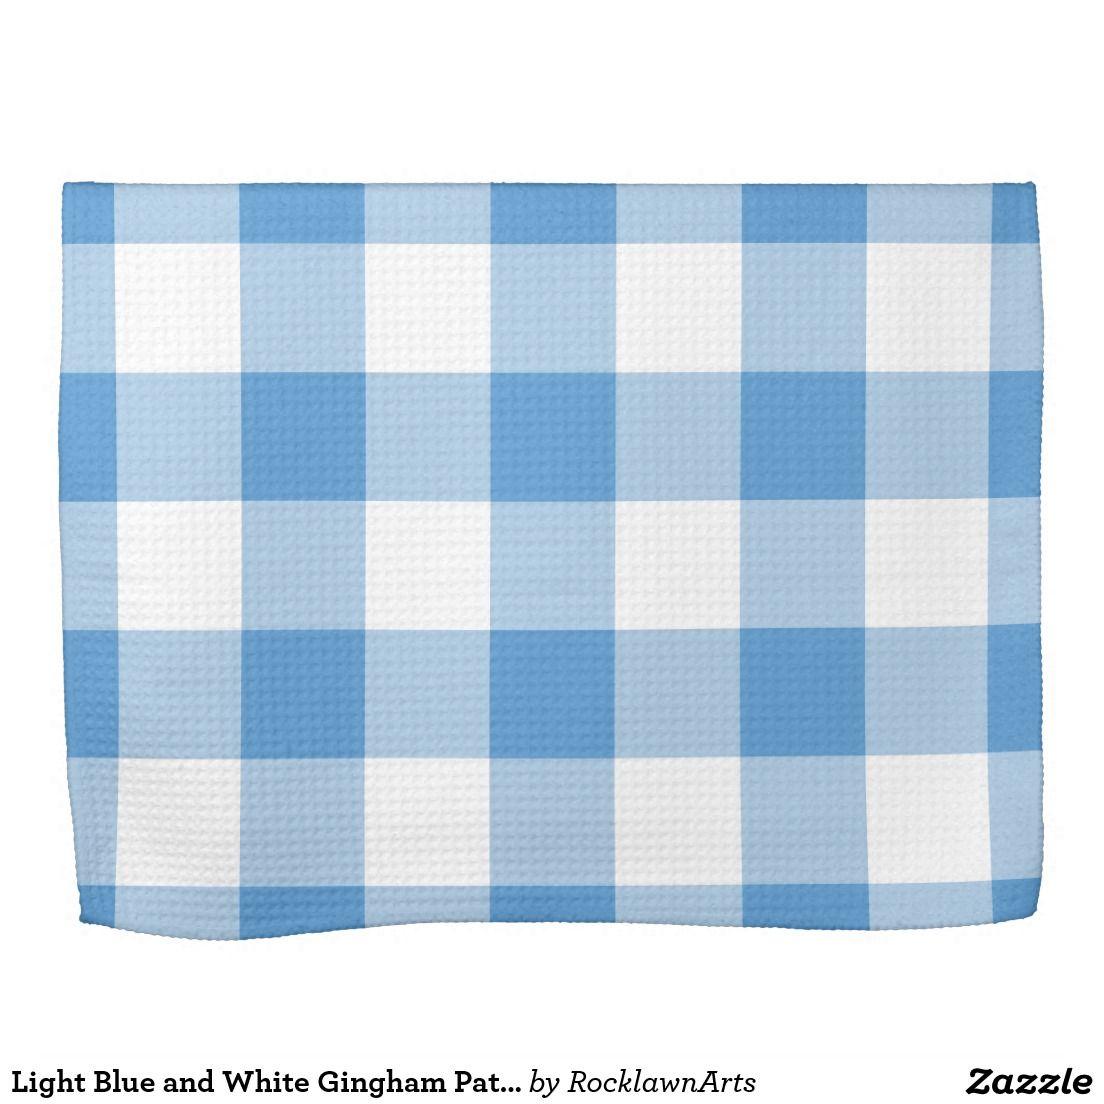 Light Blue And White Gingham Pattern Tea Towel Zazzle Co Uk